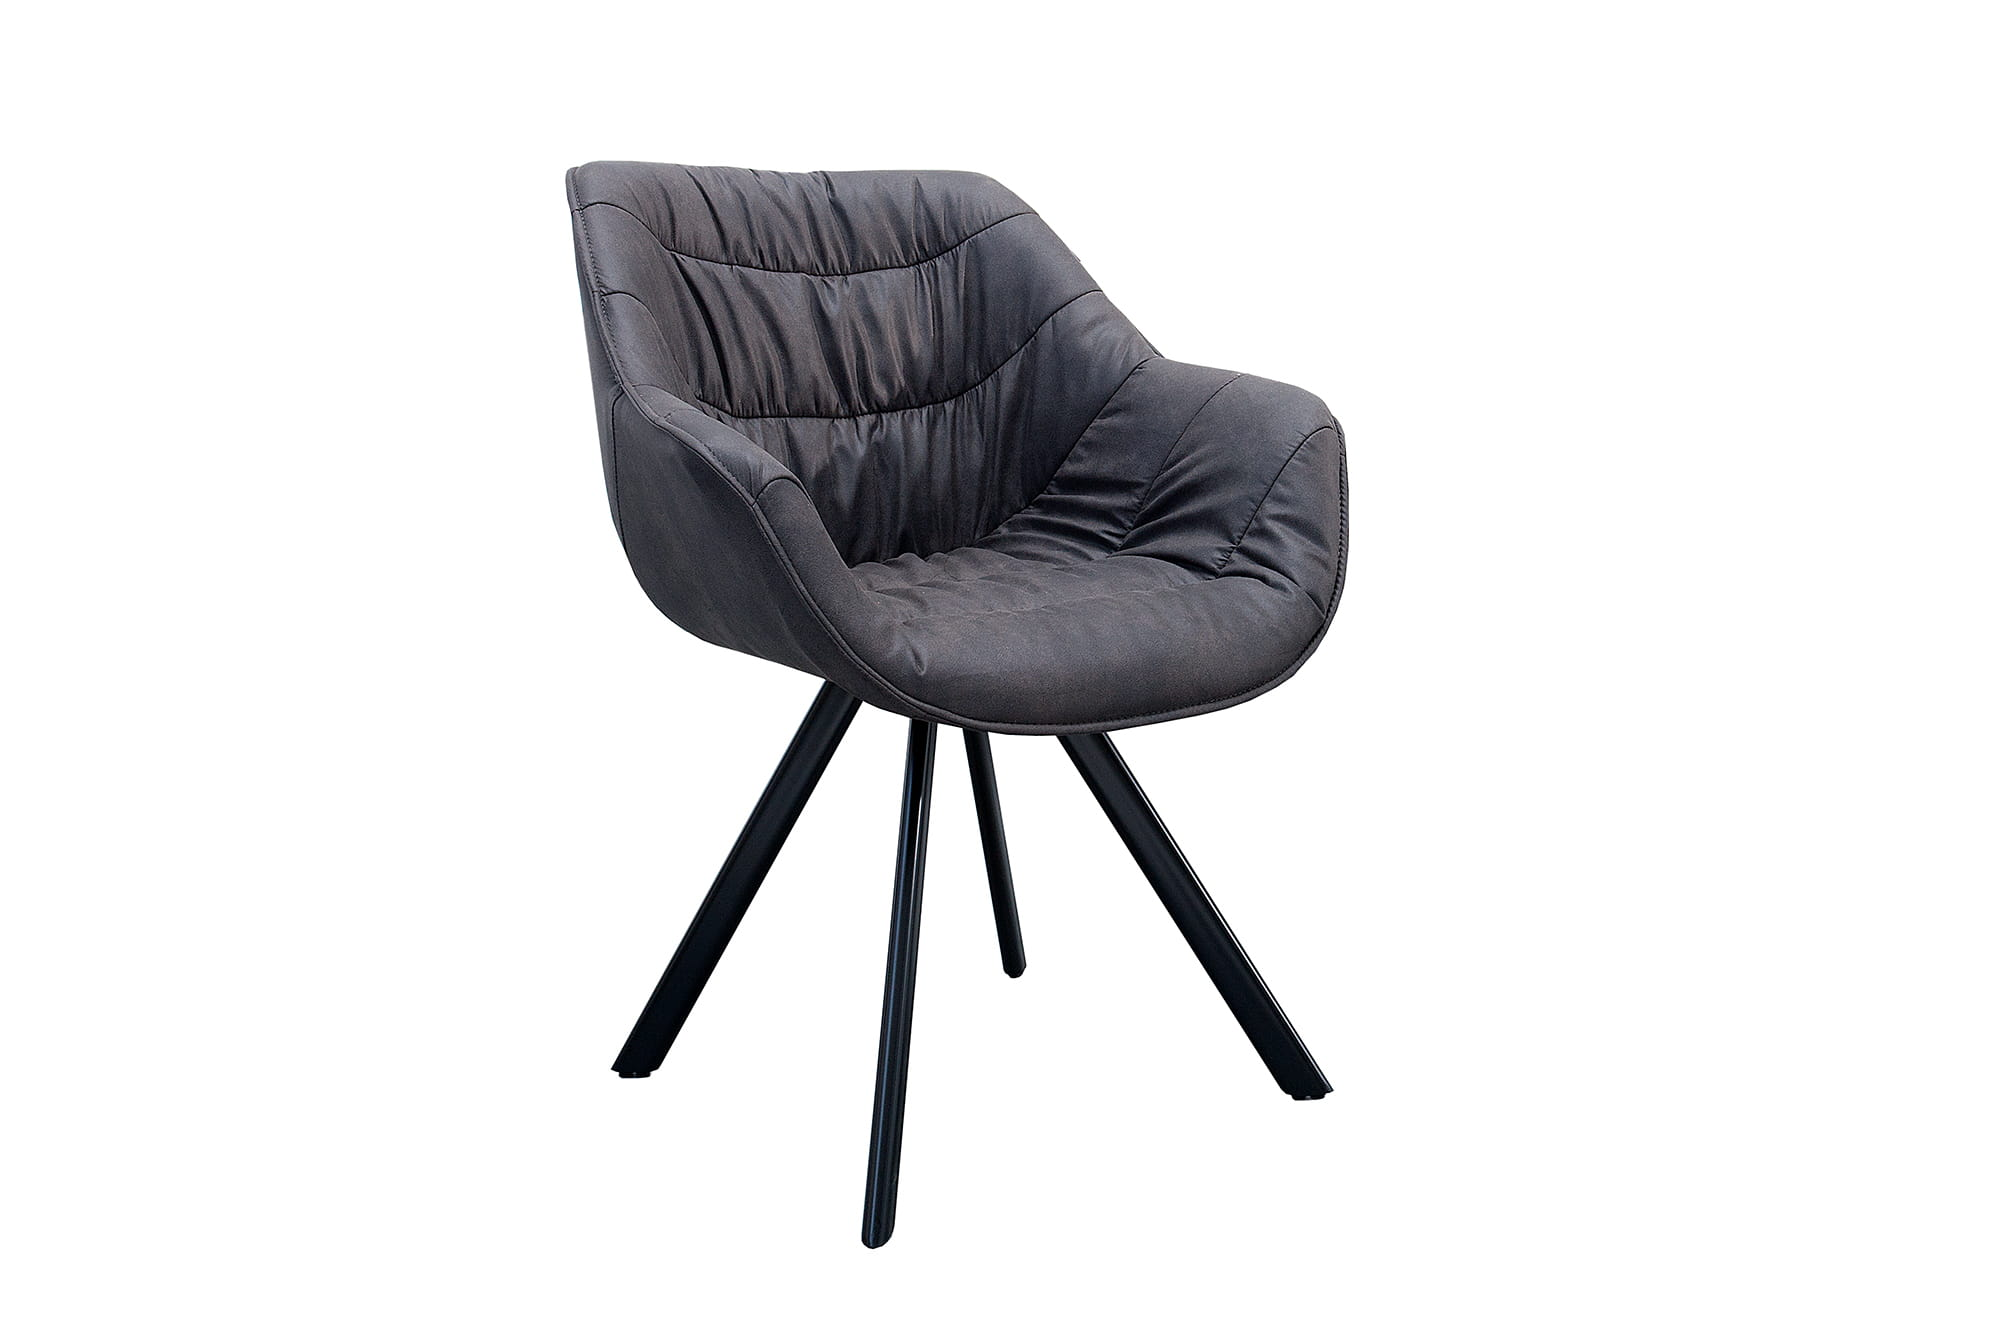 Krzesło Comfy Living szare